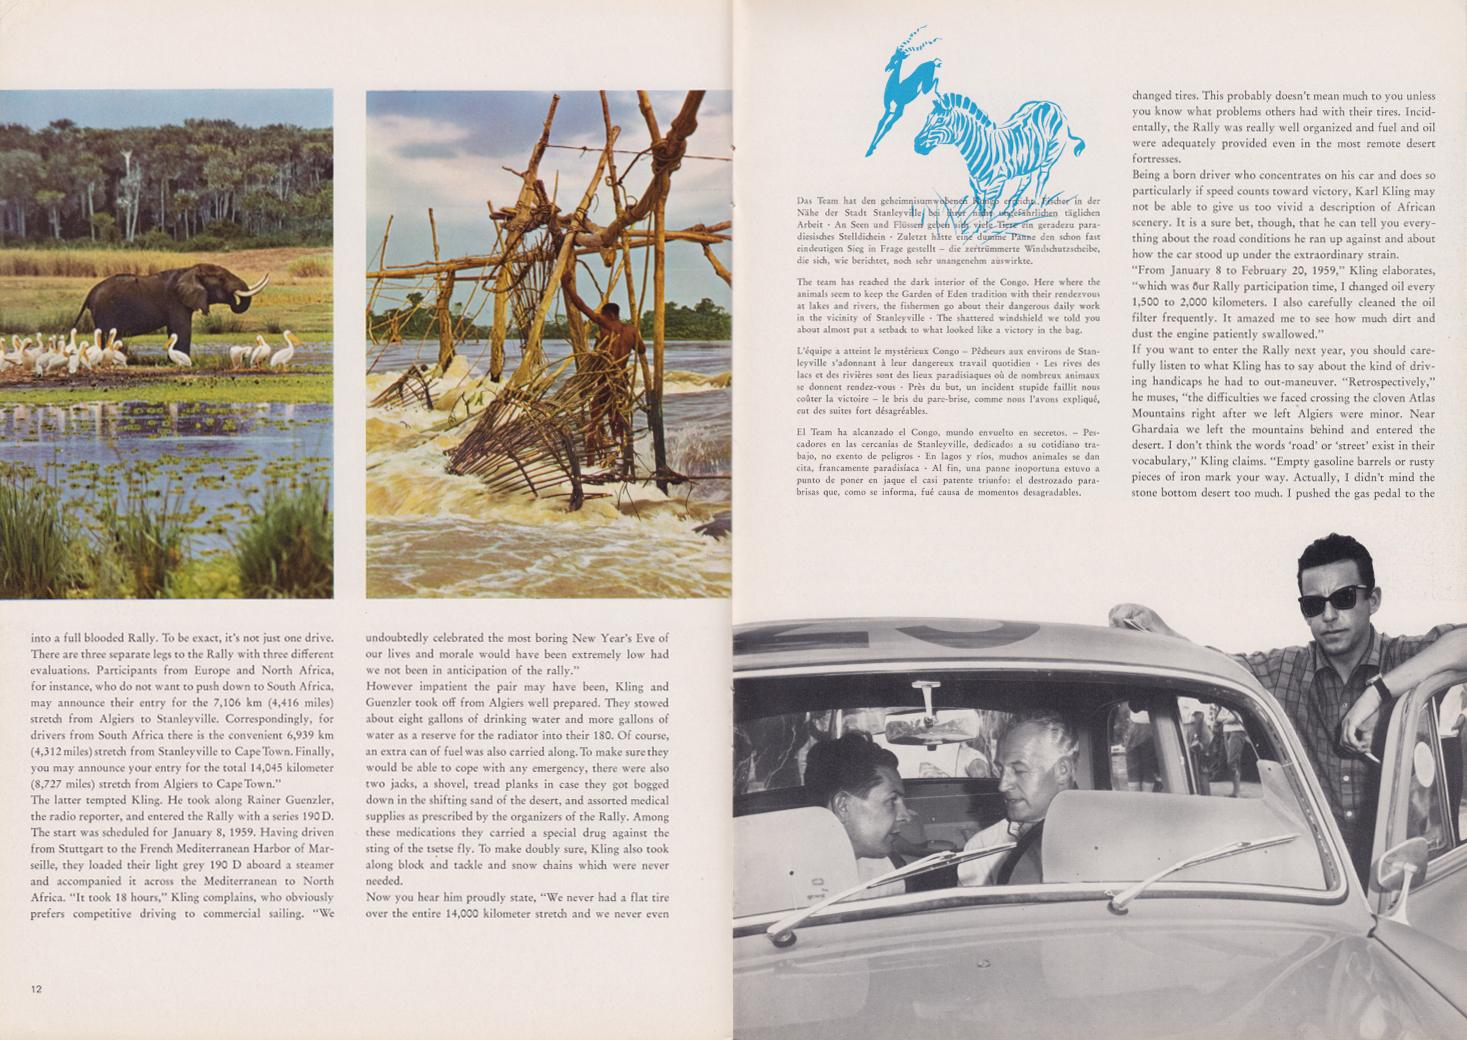 (REVISTA): Periódico In aller welt n.º 31 - Mercedes-Benz no mundo - 1959 - multilingue 007